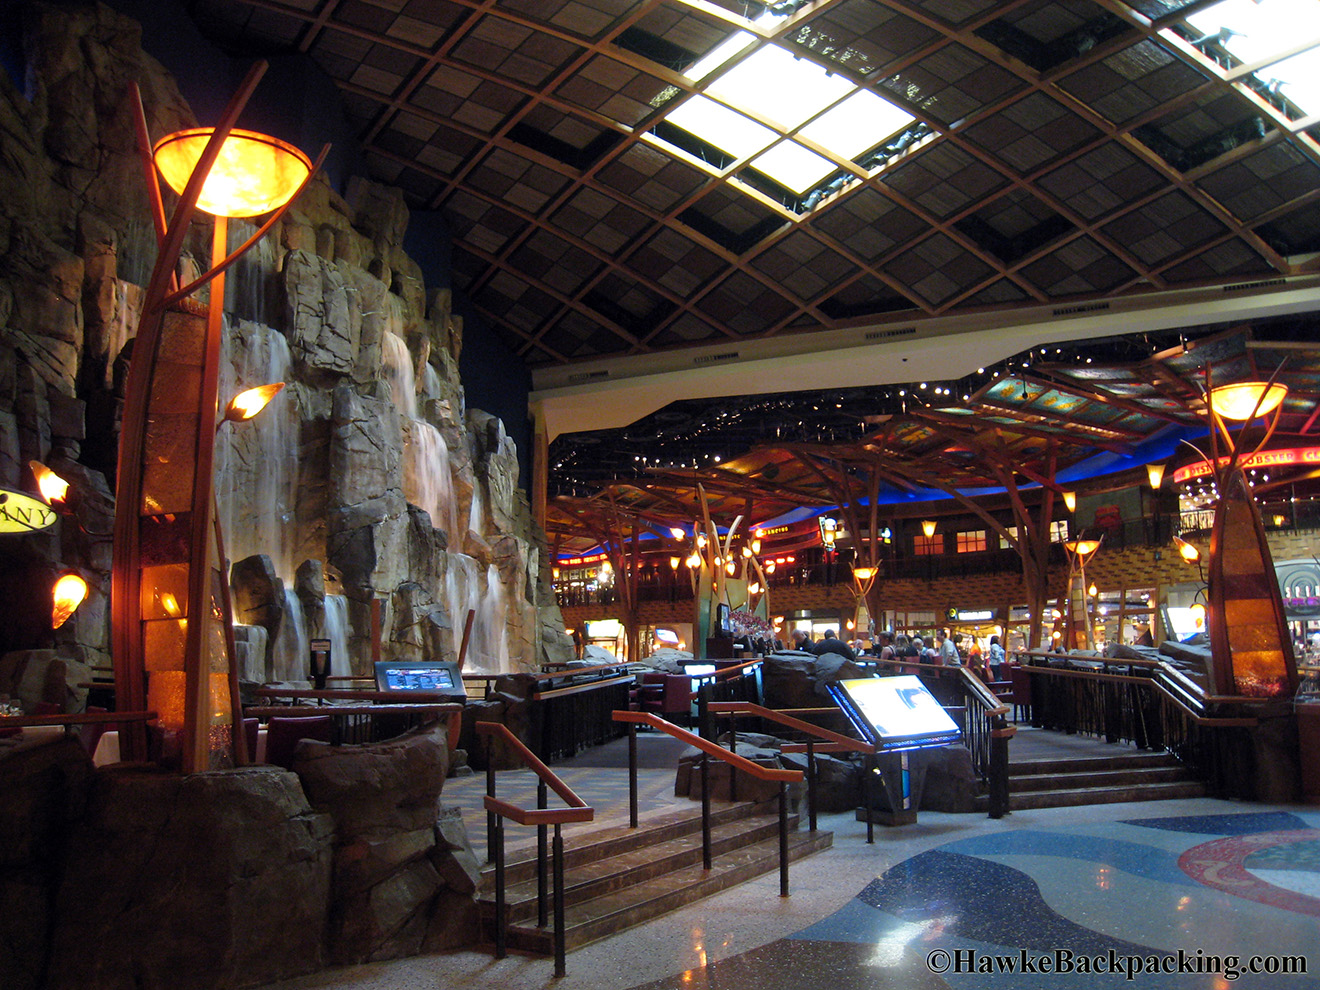 Connecticut Casino Information